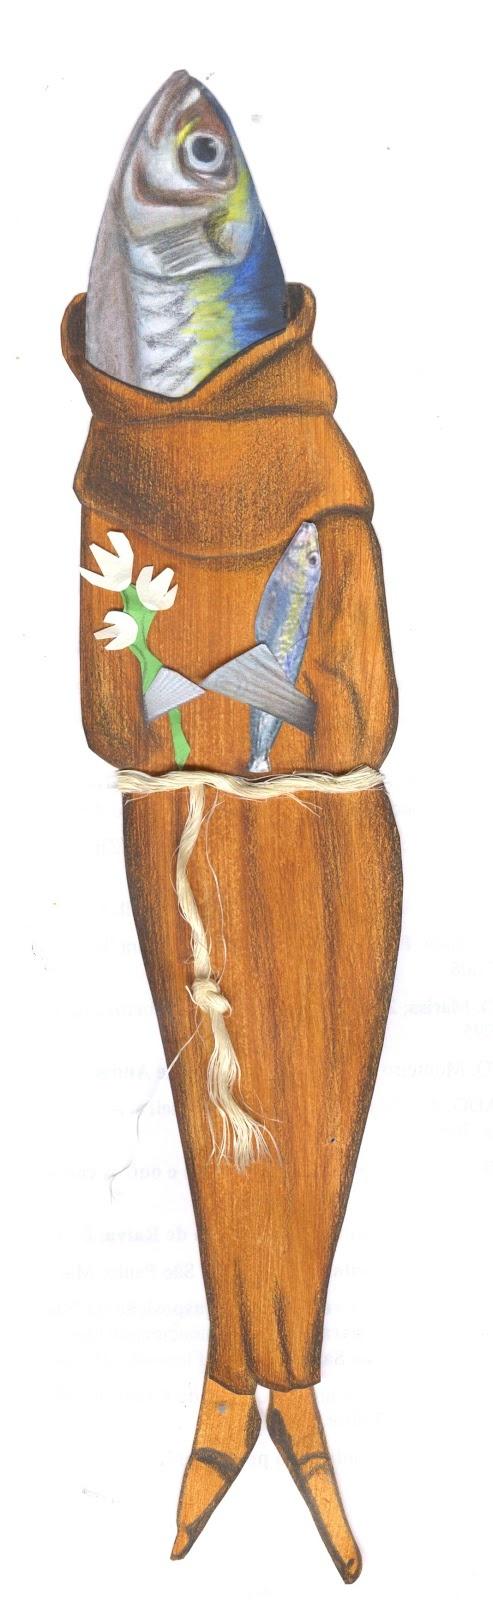 Felix murillo lleno de colores painting acrylic artwork fish art - Vivian Vilela Sardinha Santo Ant Nio Lisboa 2012 Fish Talesfish Art Portugalaprilcowdecoupagepaintingssan Antoniolisbon